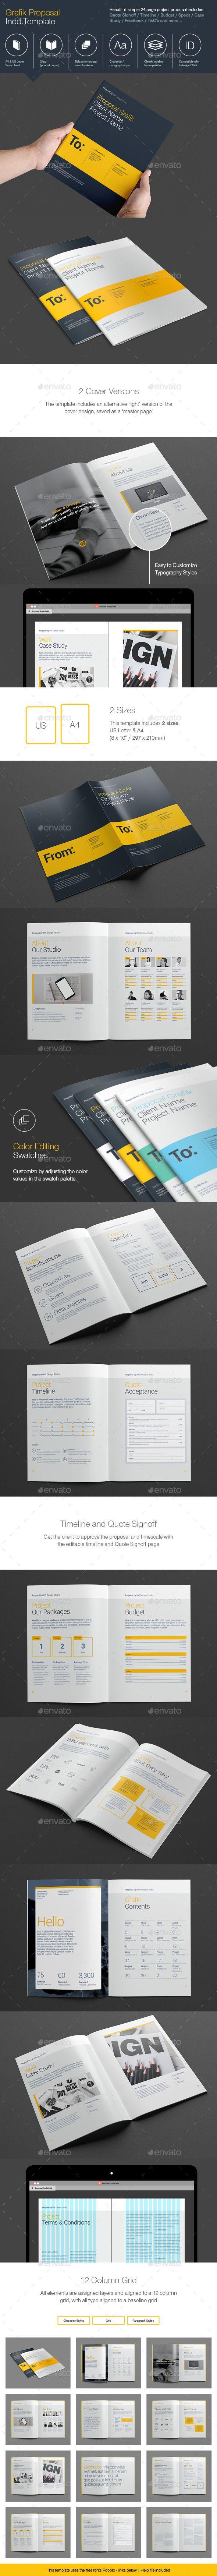 Grafik Proposal Template #design #print Download: http://graphicriver.net/item/grafik-proposal/11959028?ref=ksioks